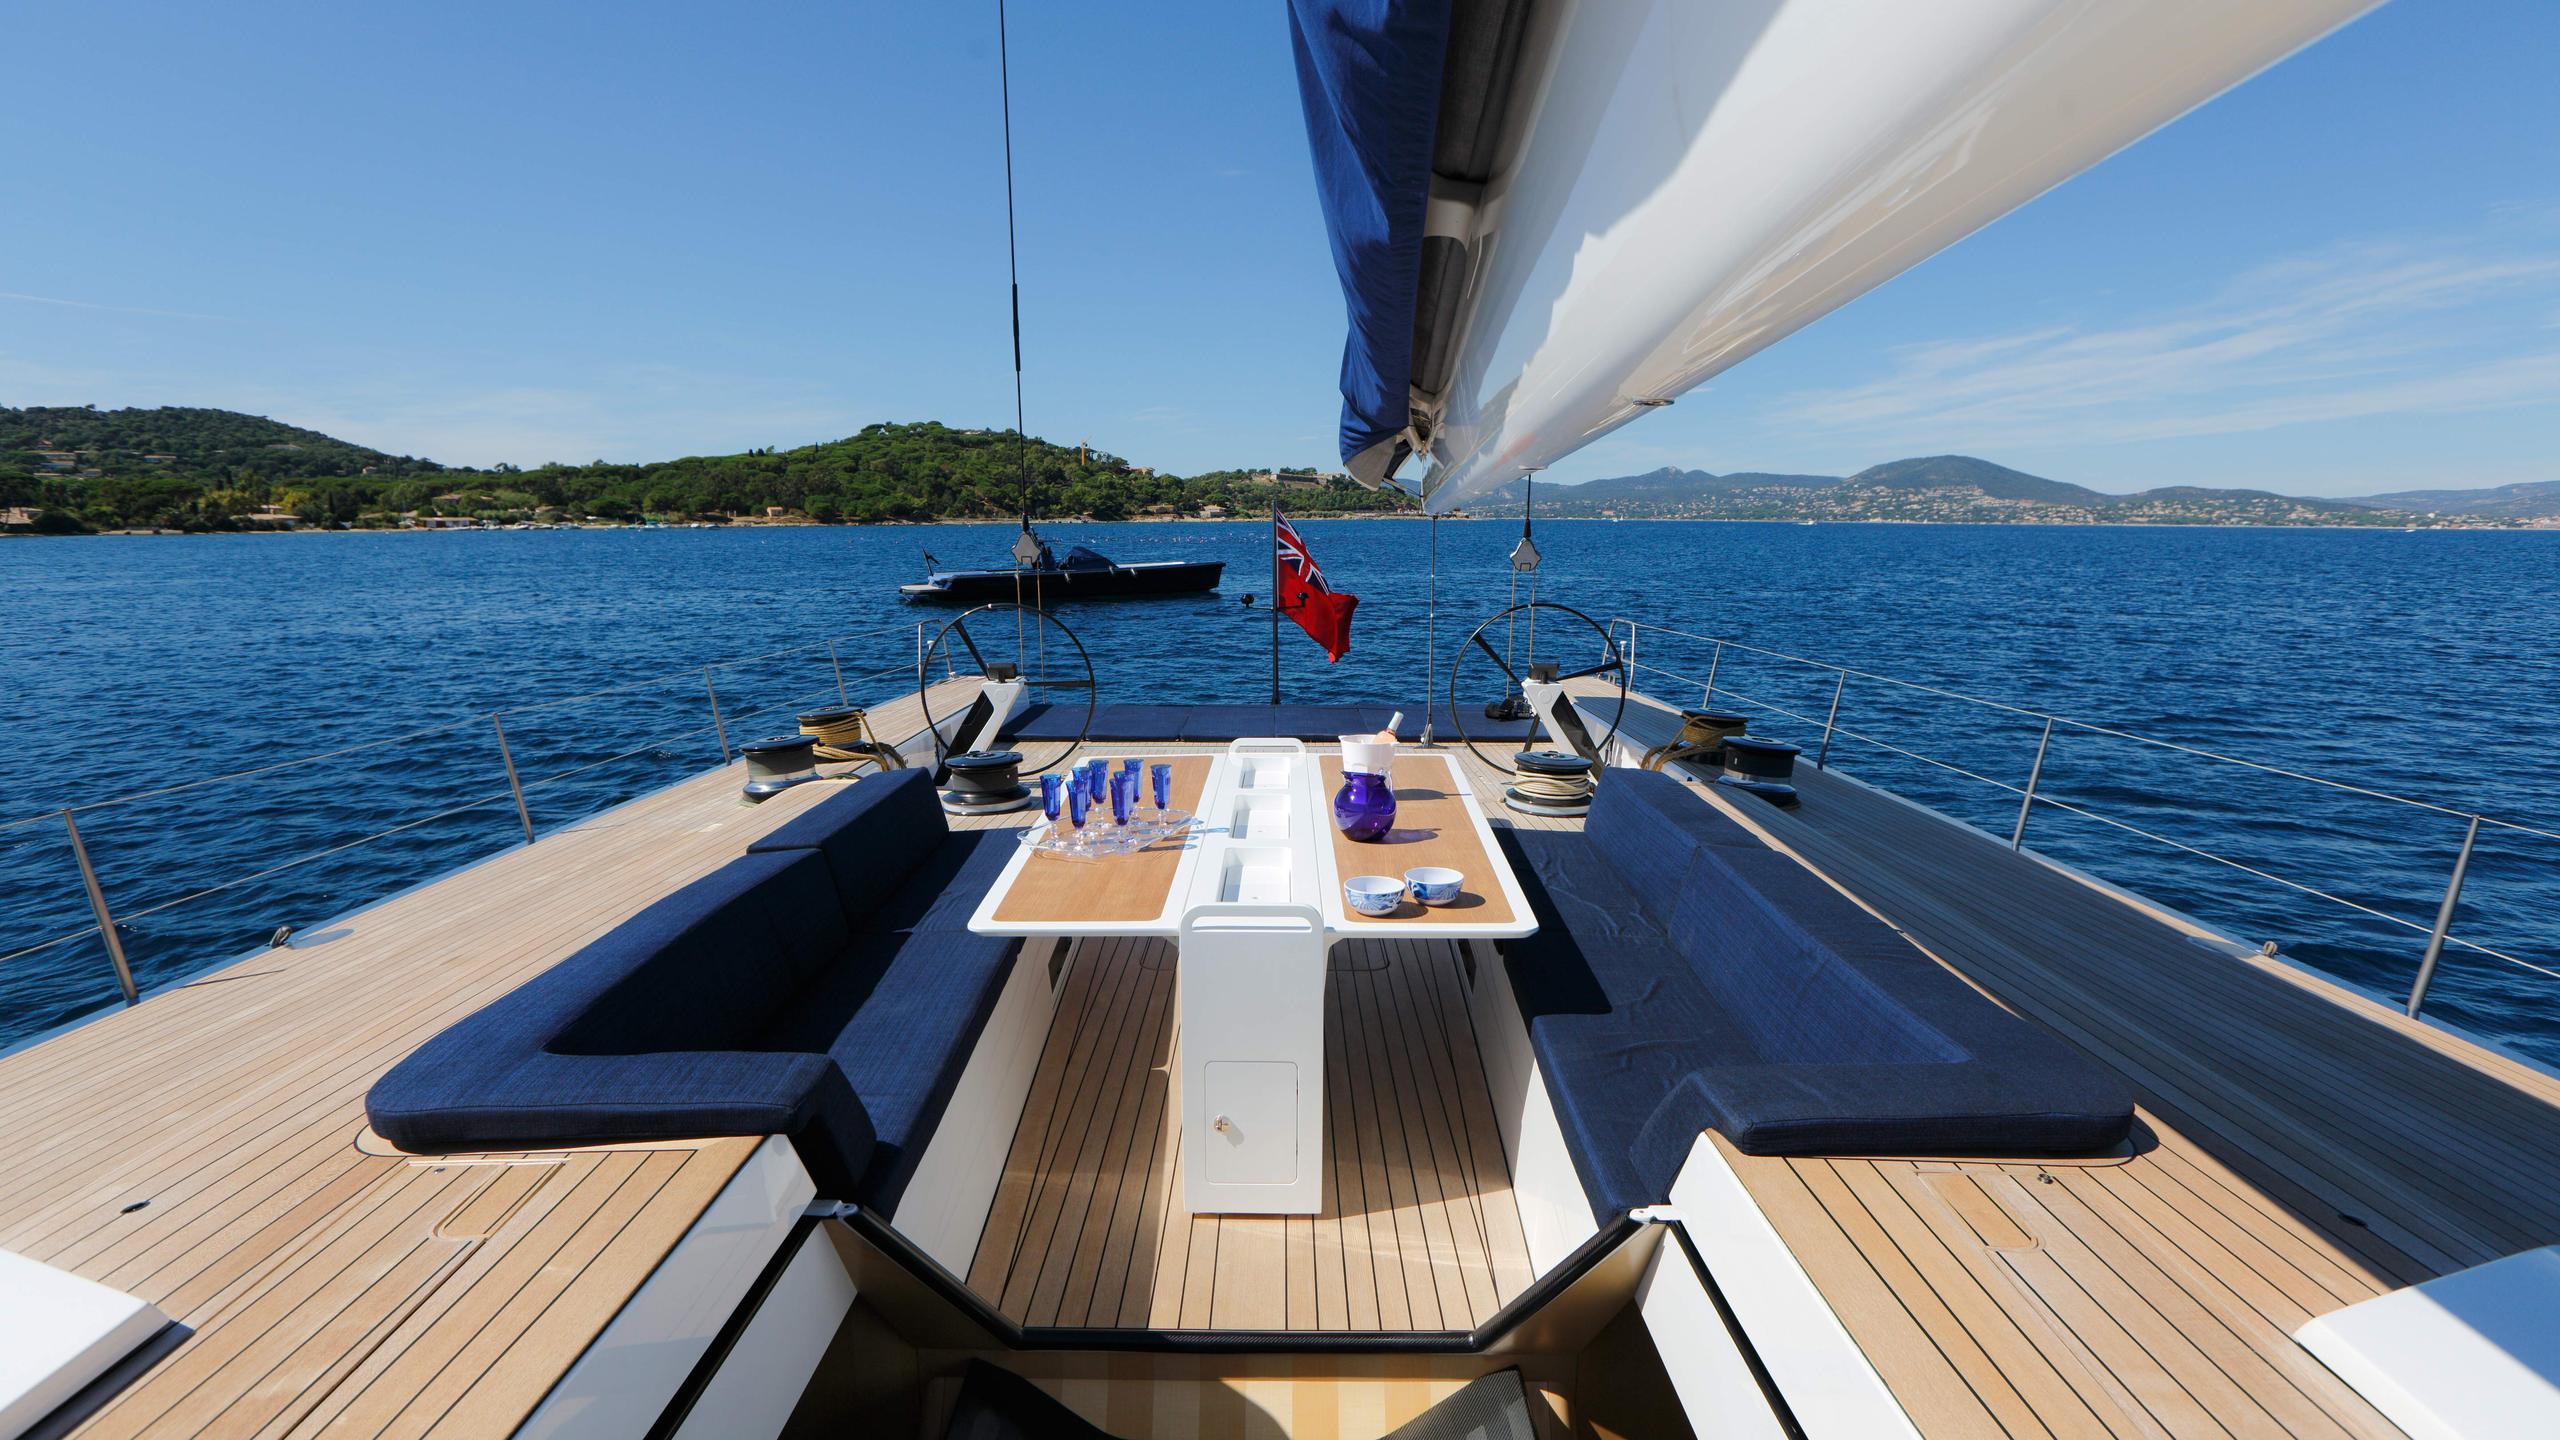 Magic-Carpet-iii-sailing-yacht-wally-21013-30m-deck